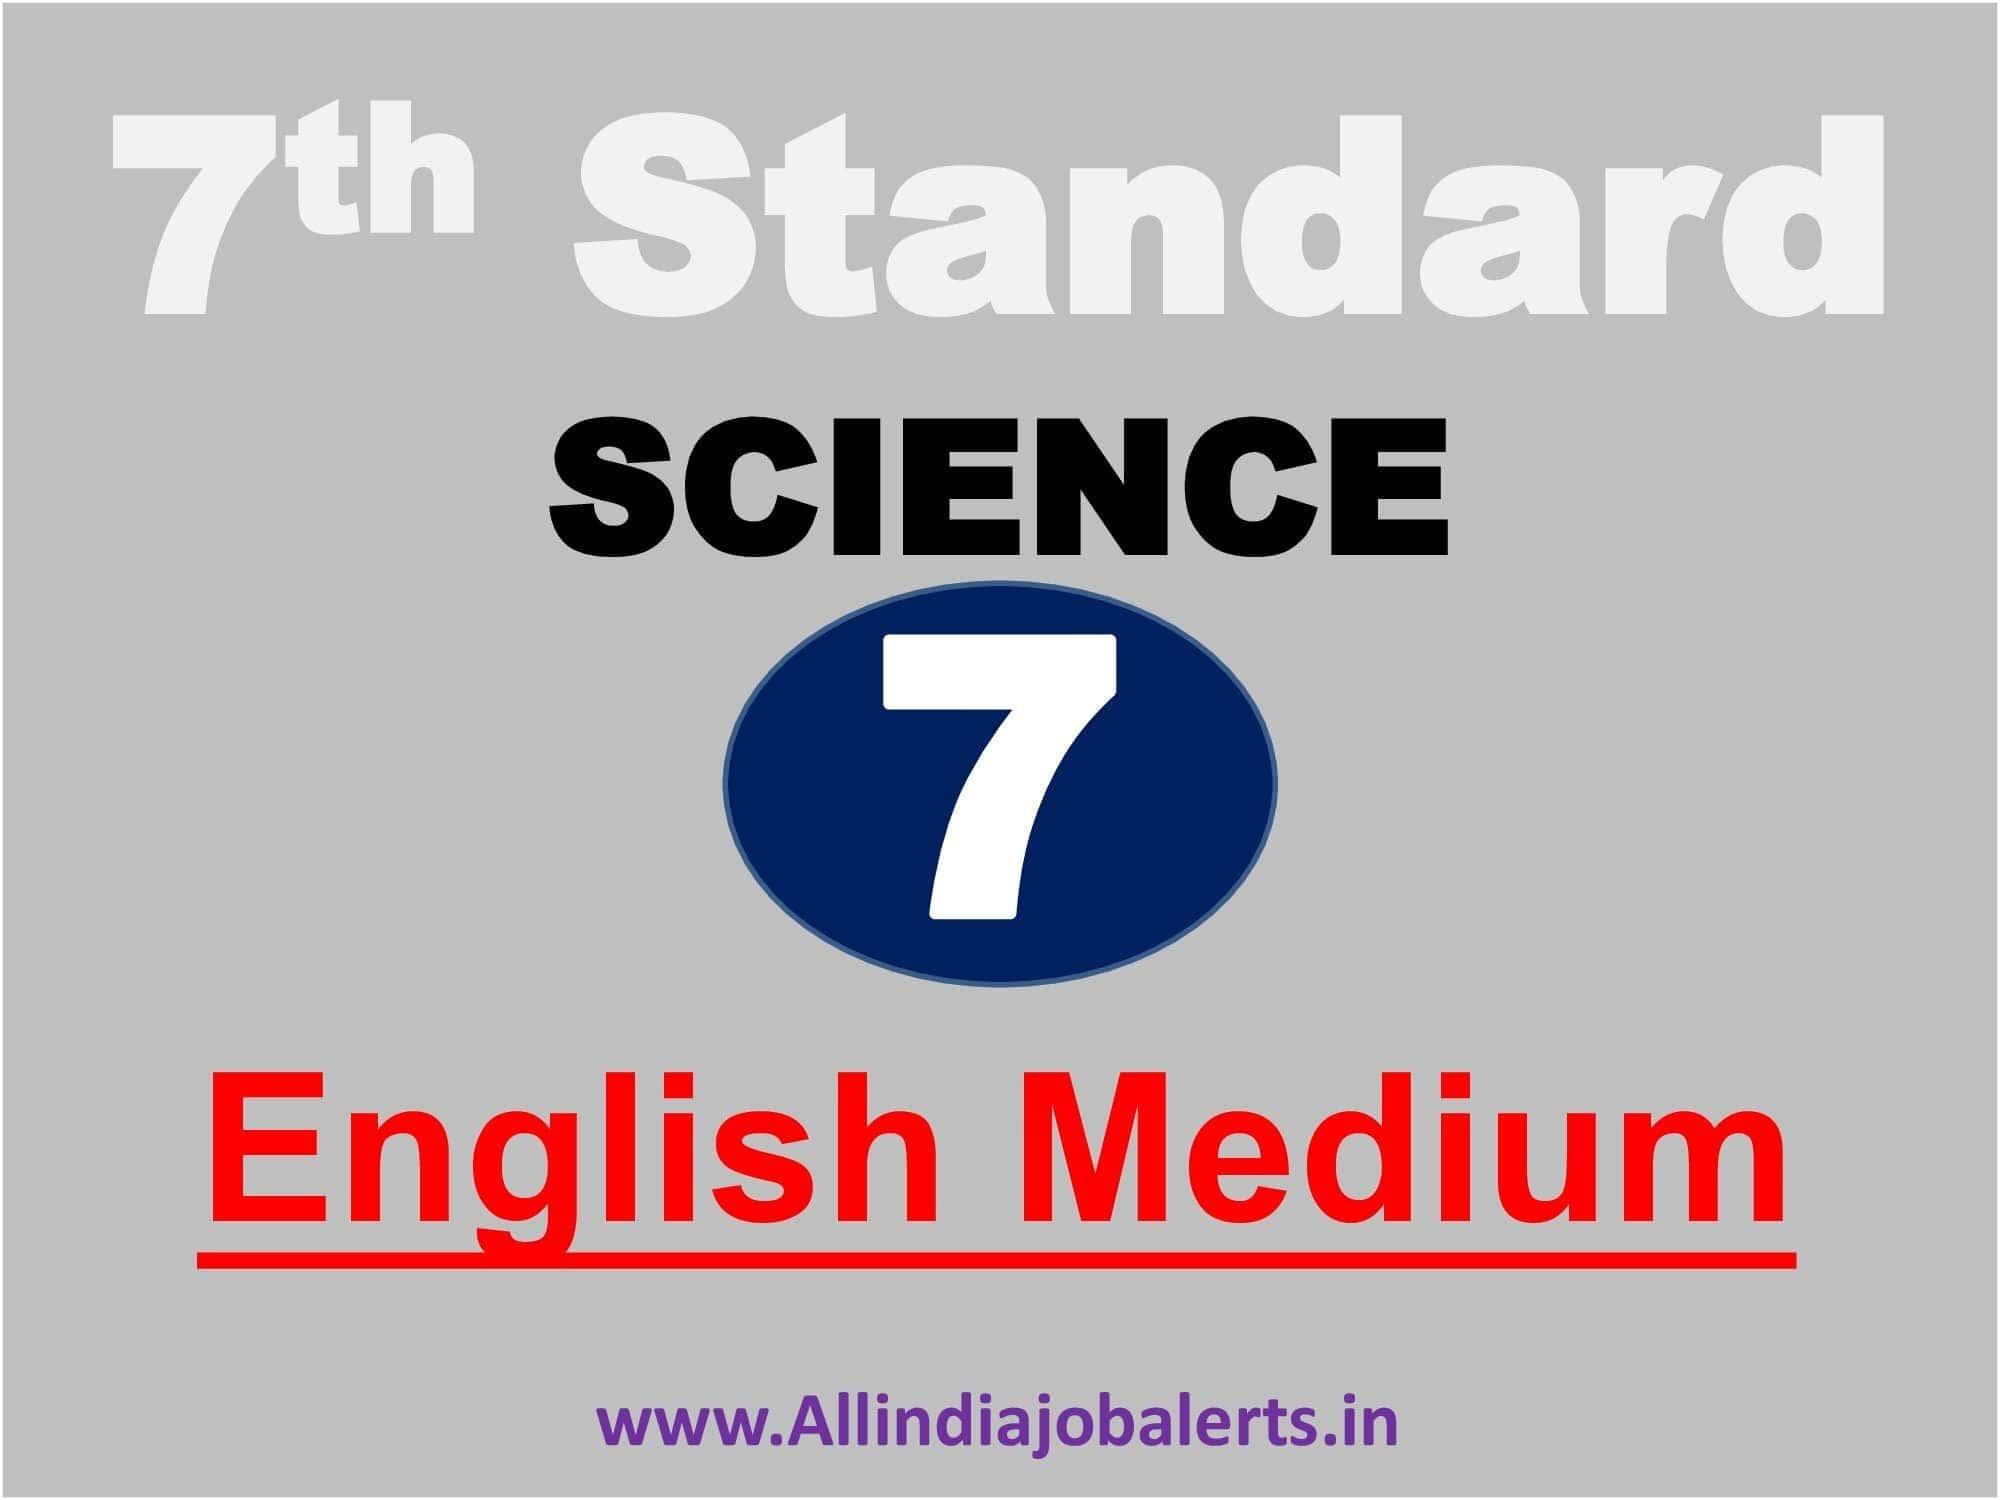 7th standard science